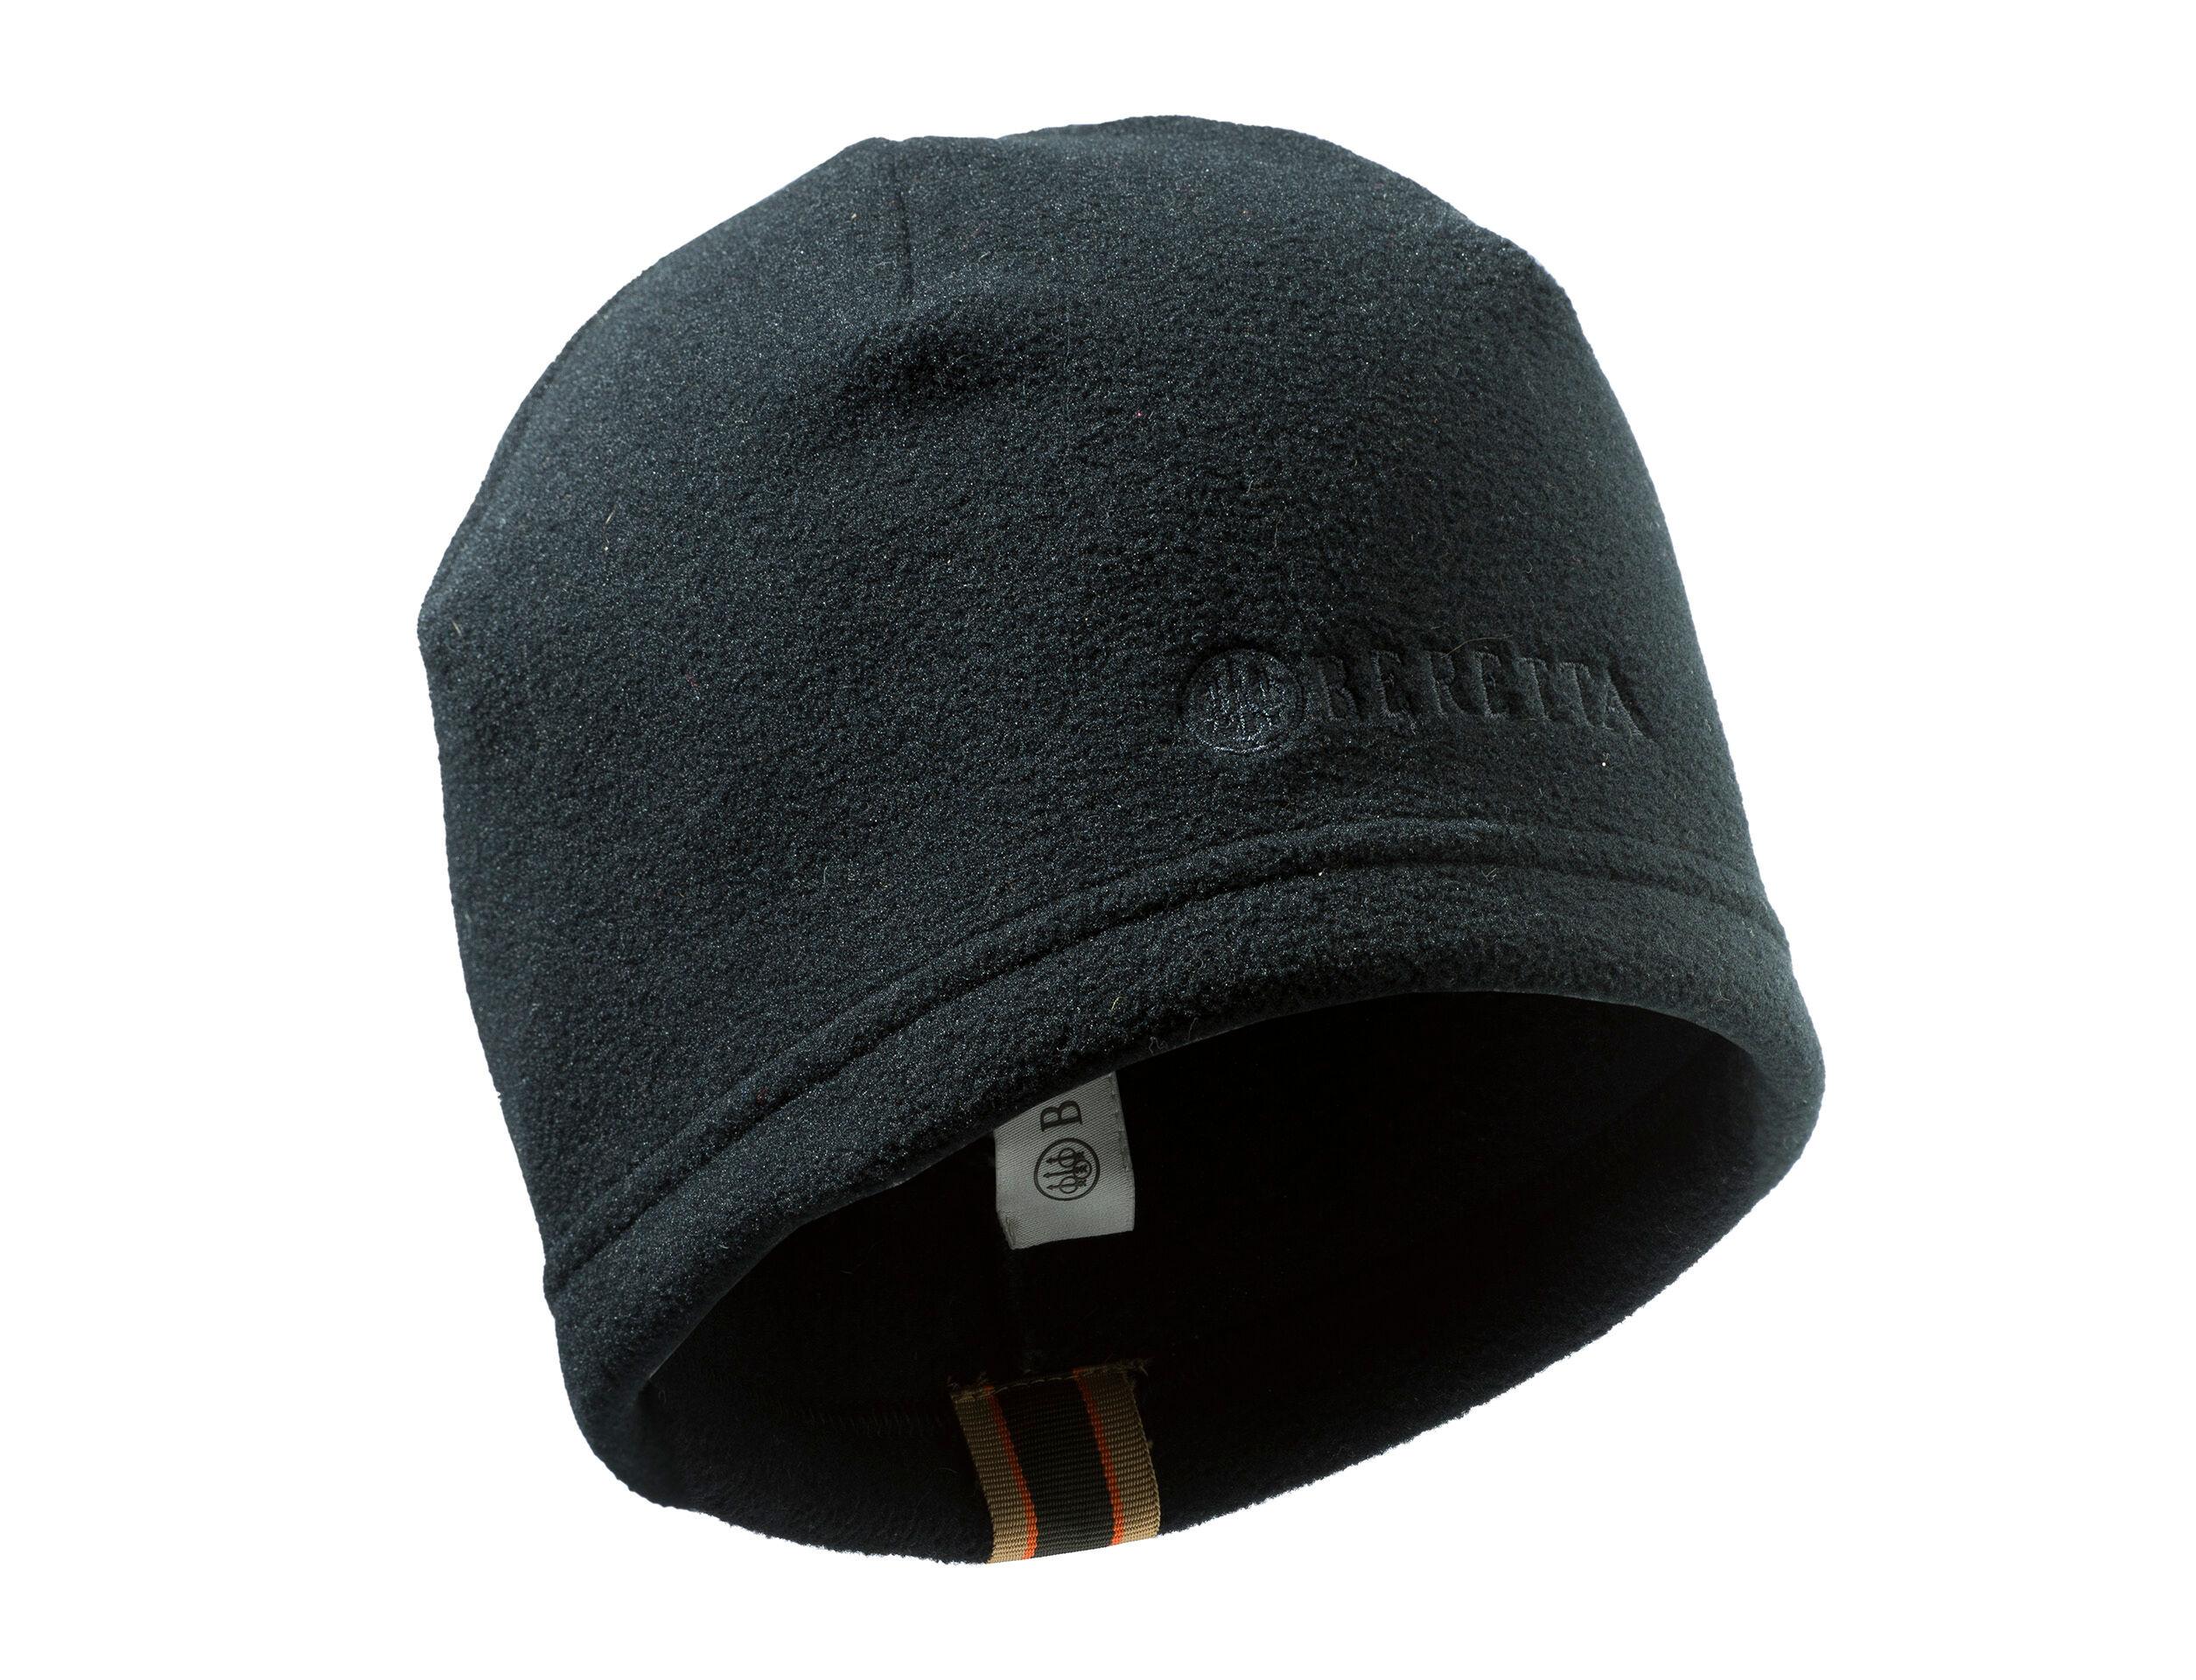 BerettaUSA   Beanie in Black, Fleece, Size: Medium